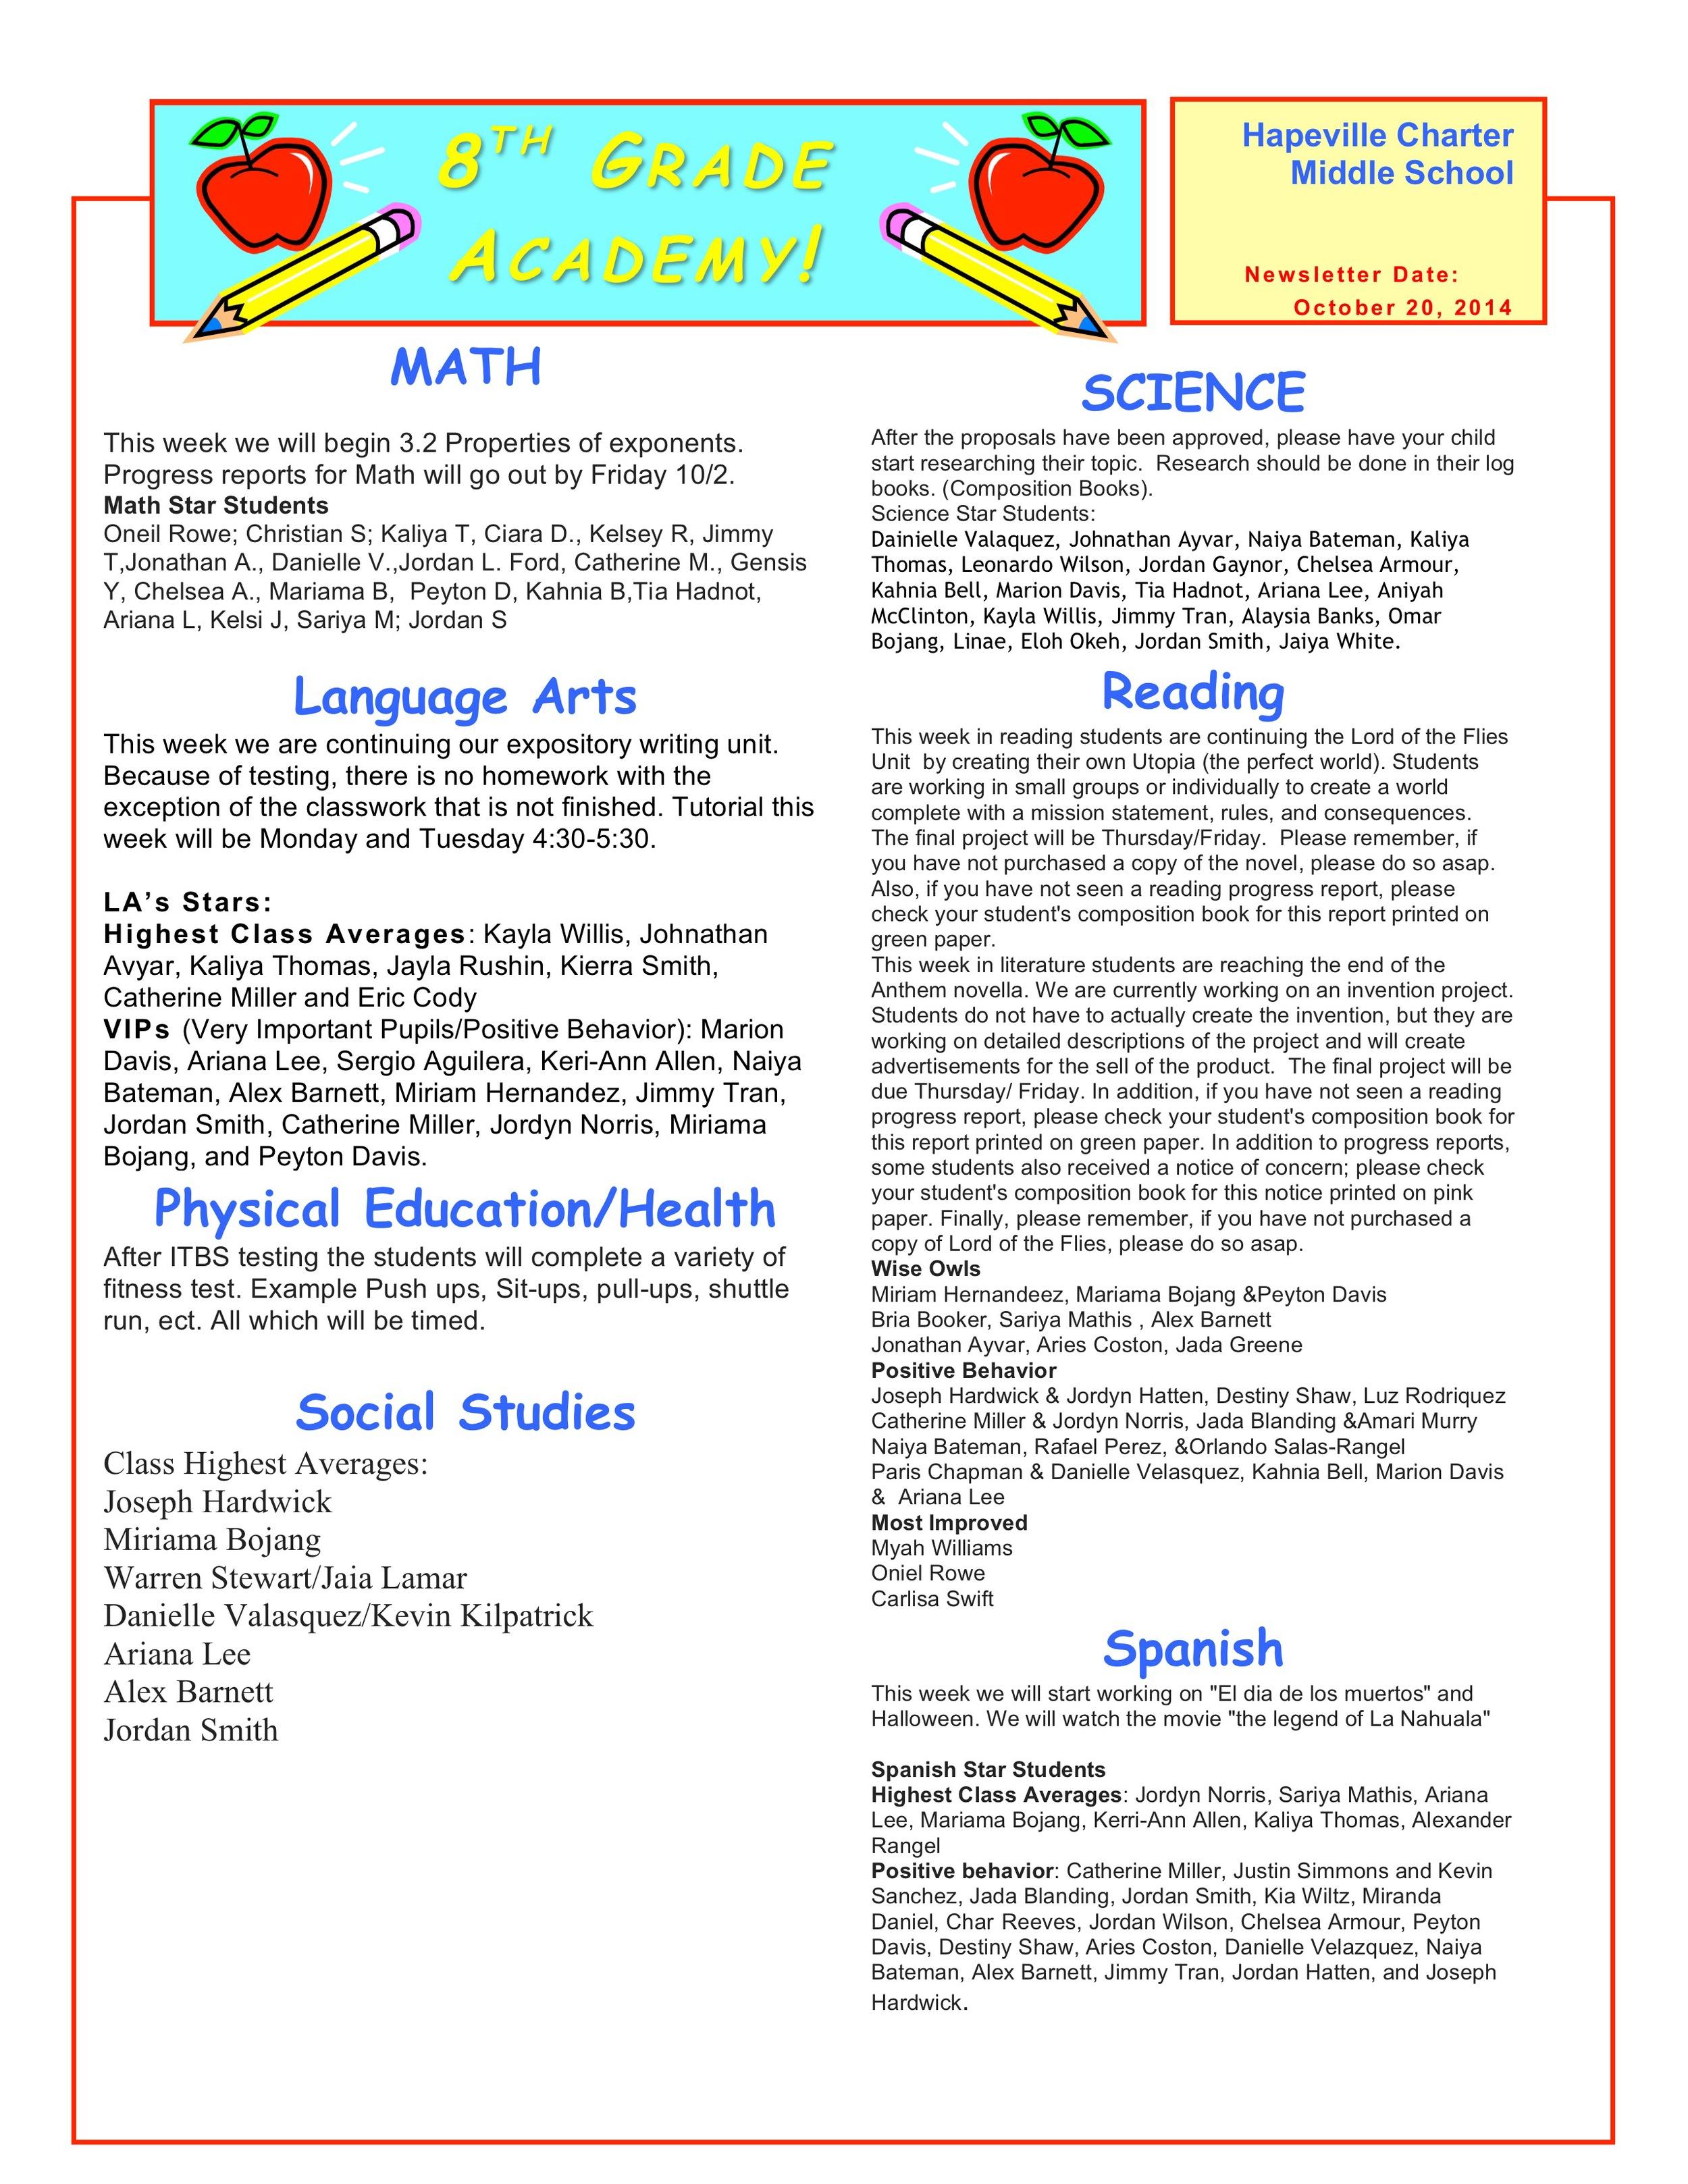 Newsletter Image8th grade october 20.jpeg